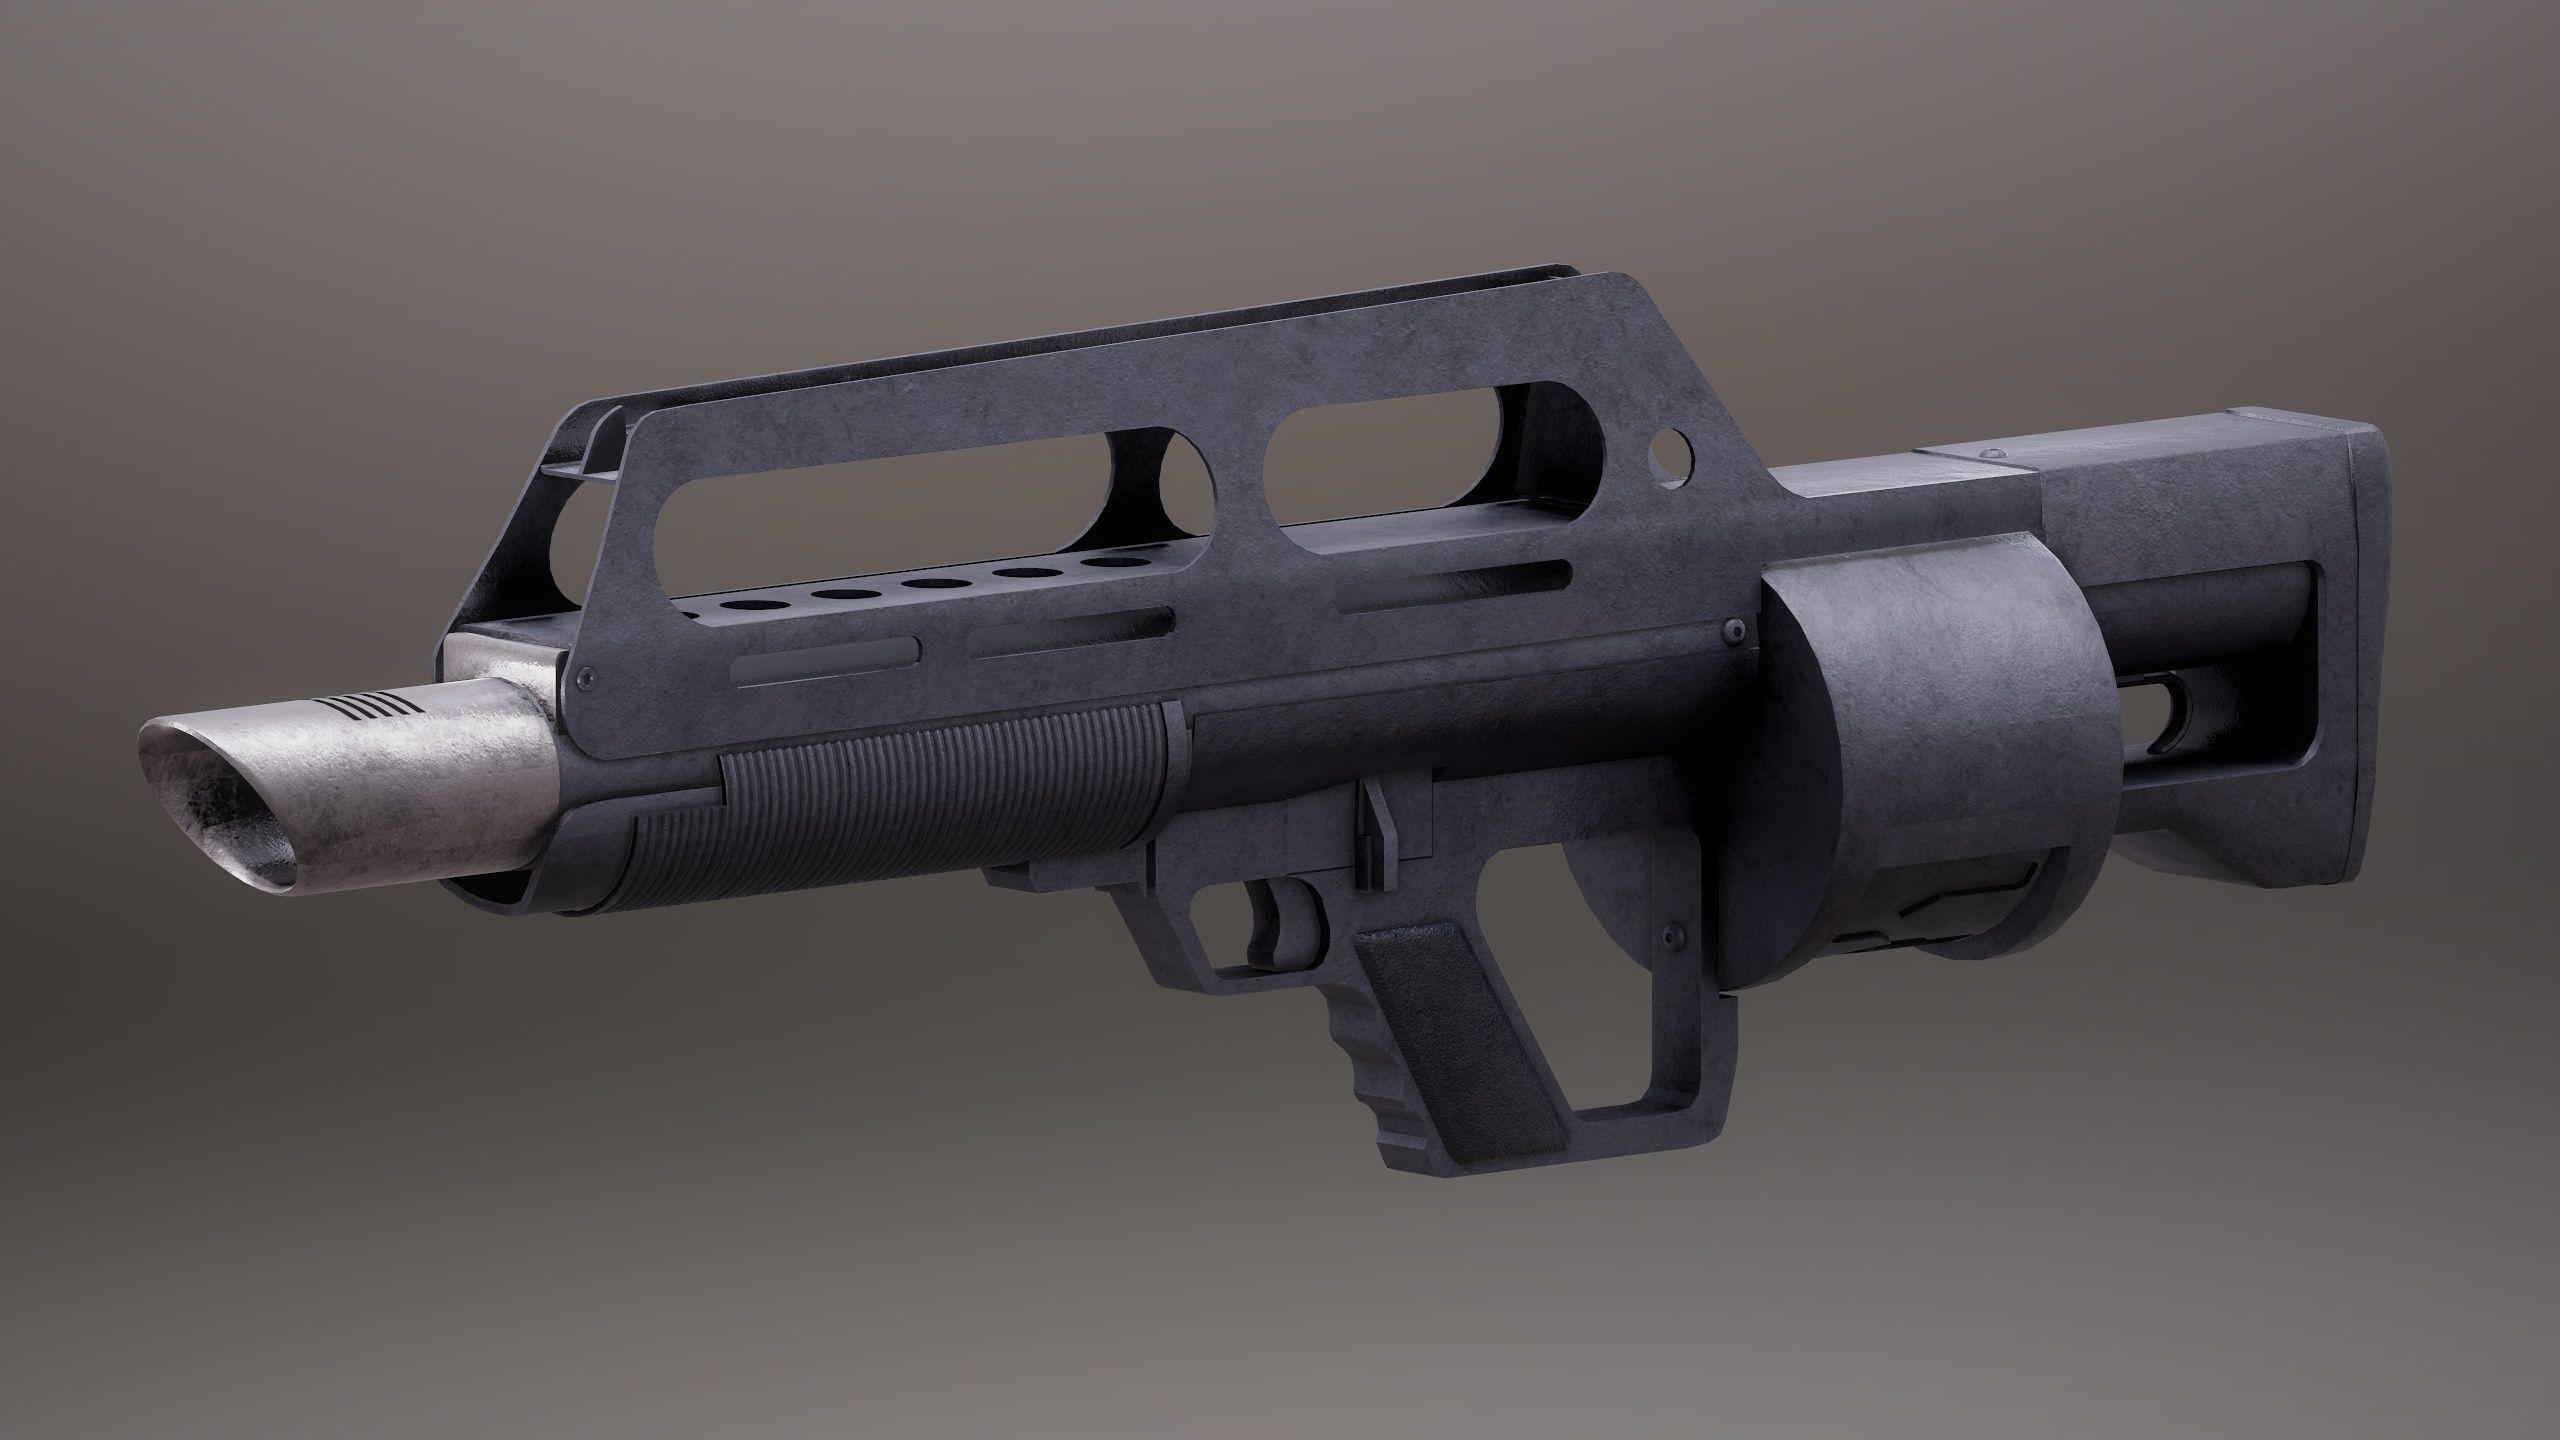 Pancor Jackhammer Rigged PBR